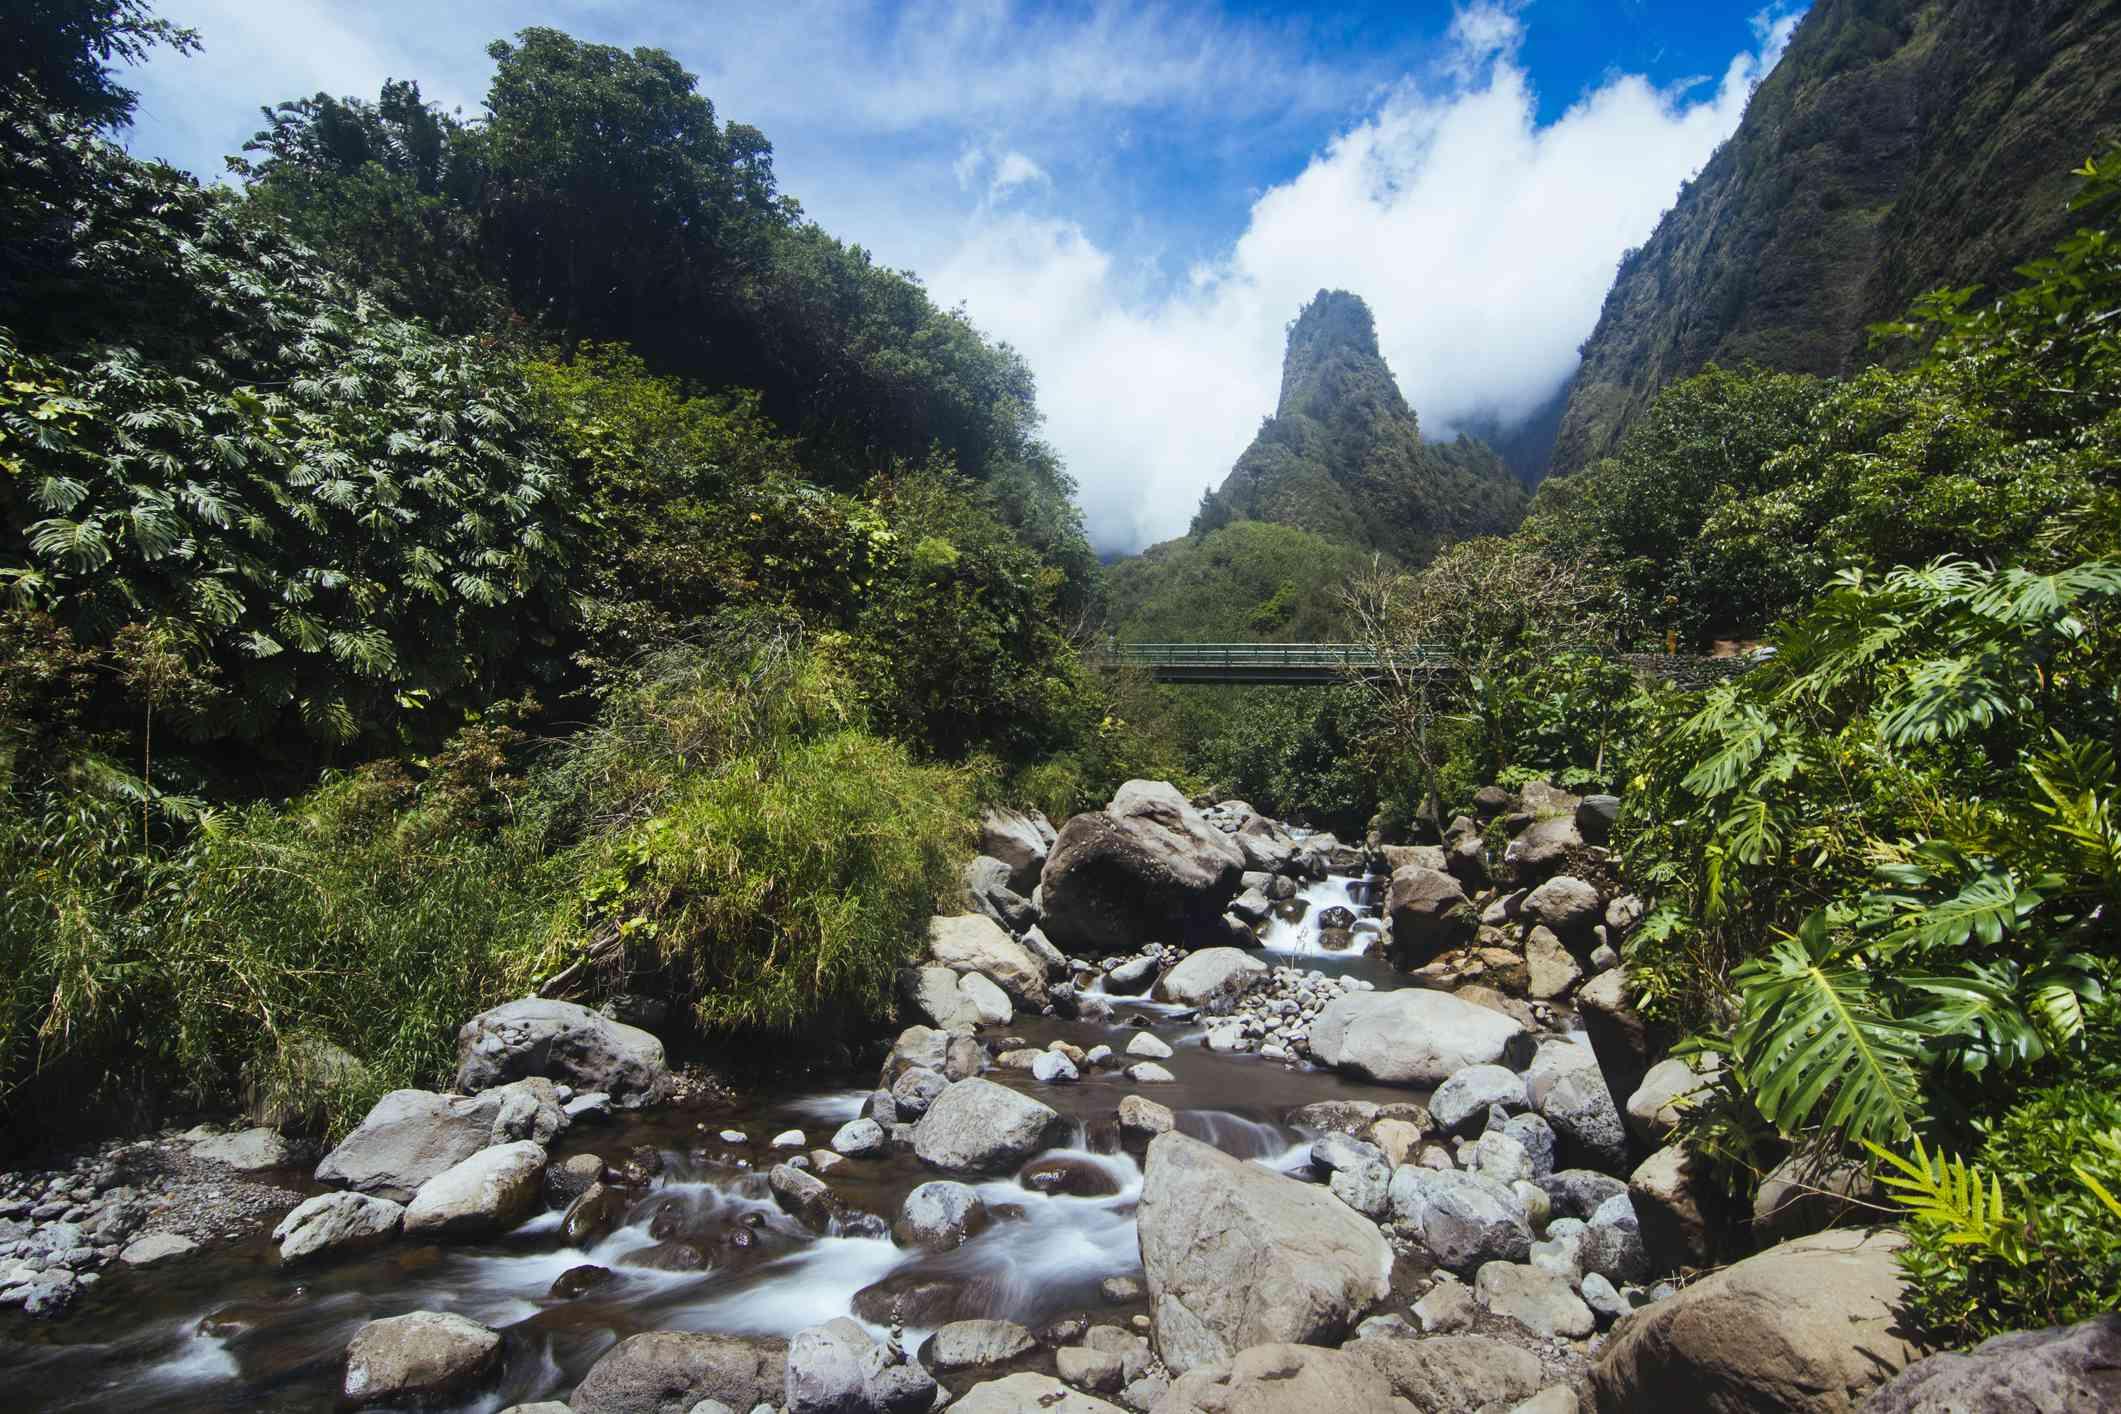 View of Iao Needle Mountain inside the Iao Valley